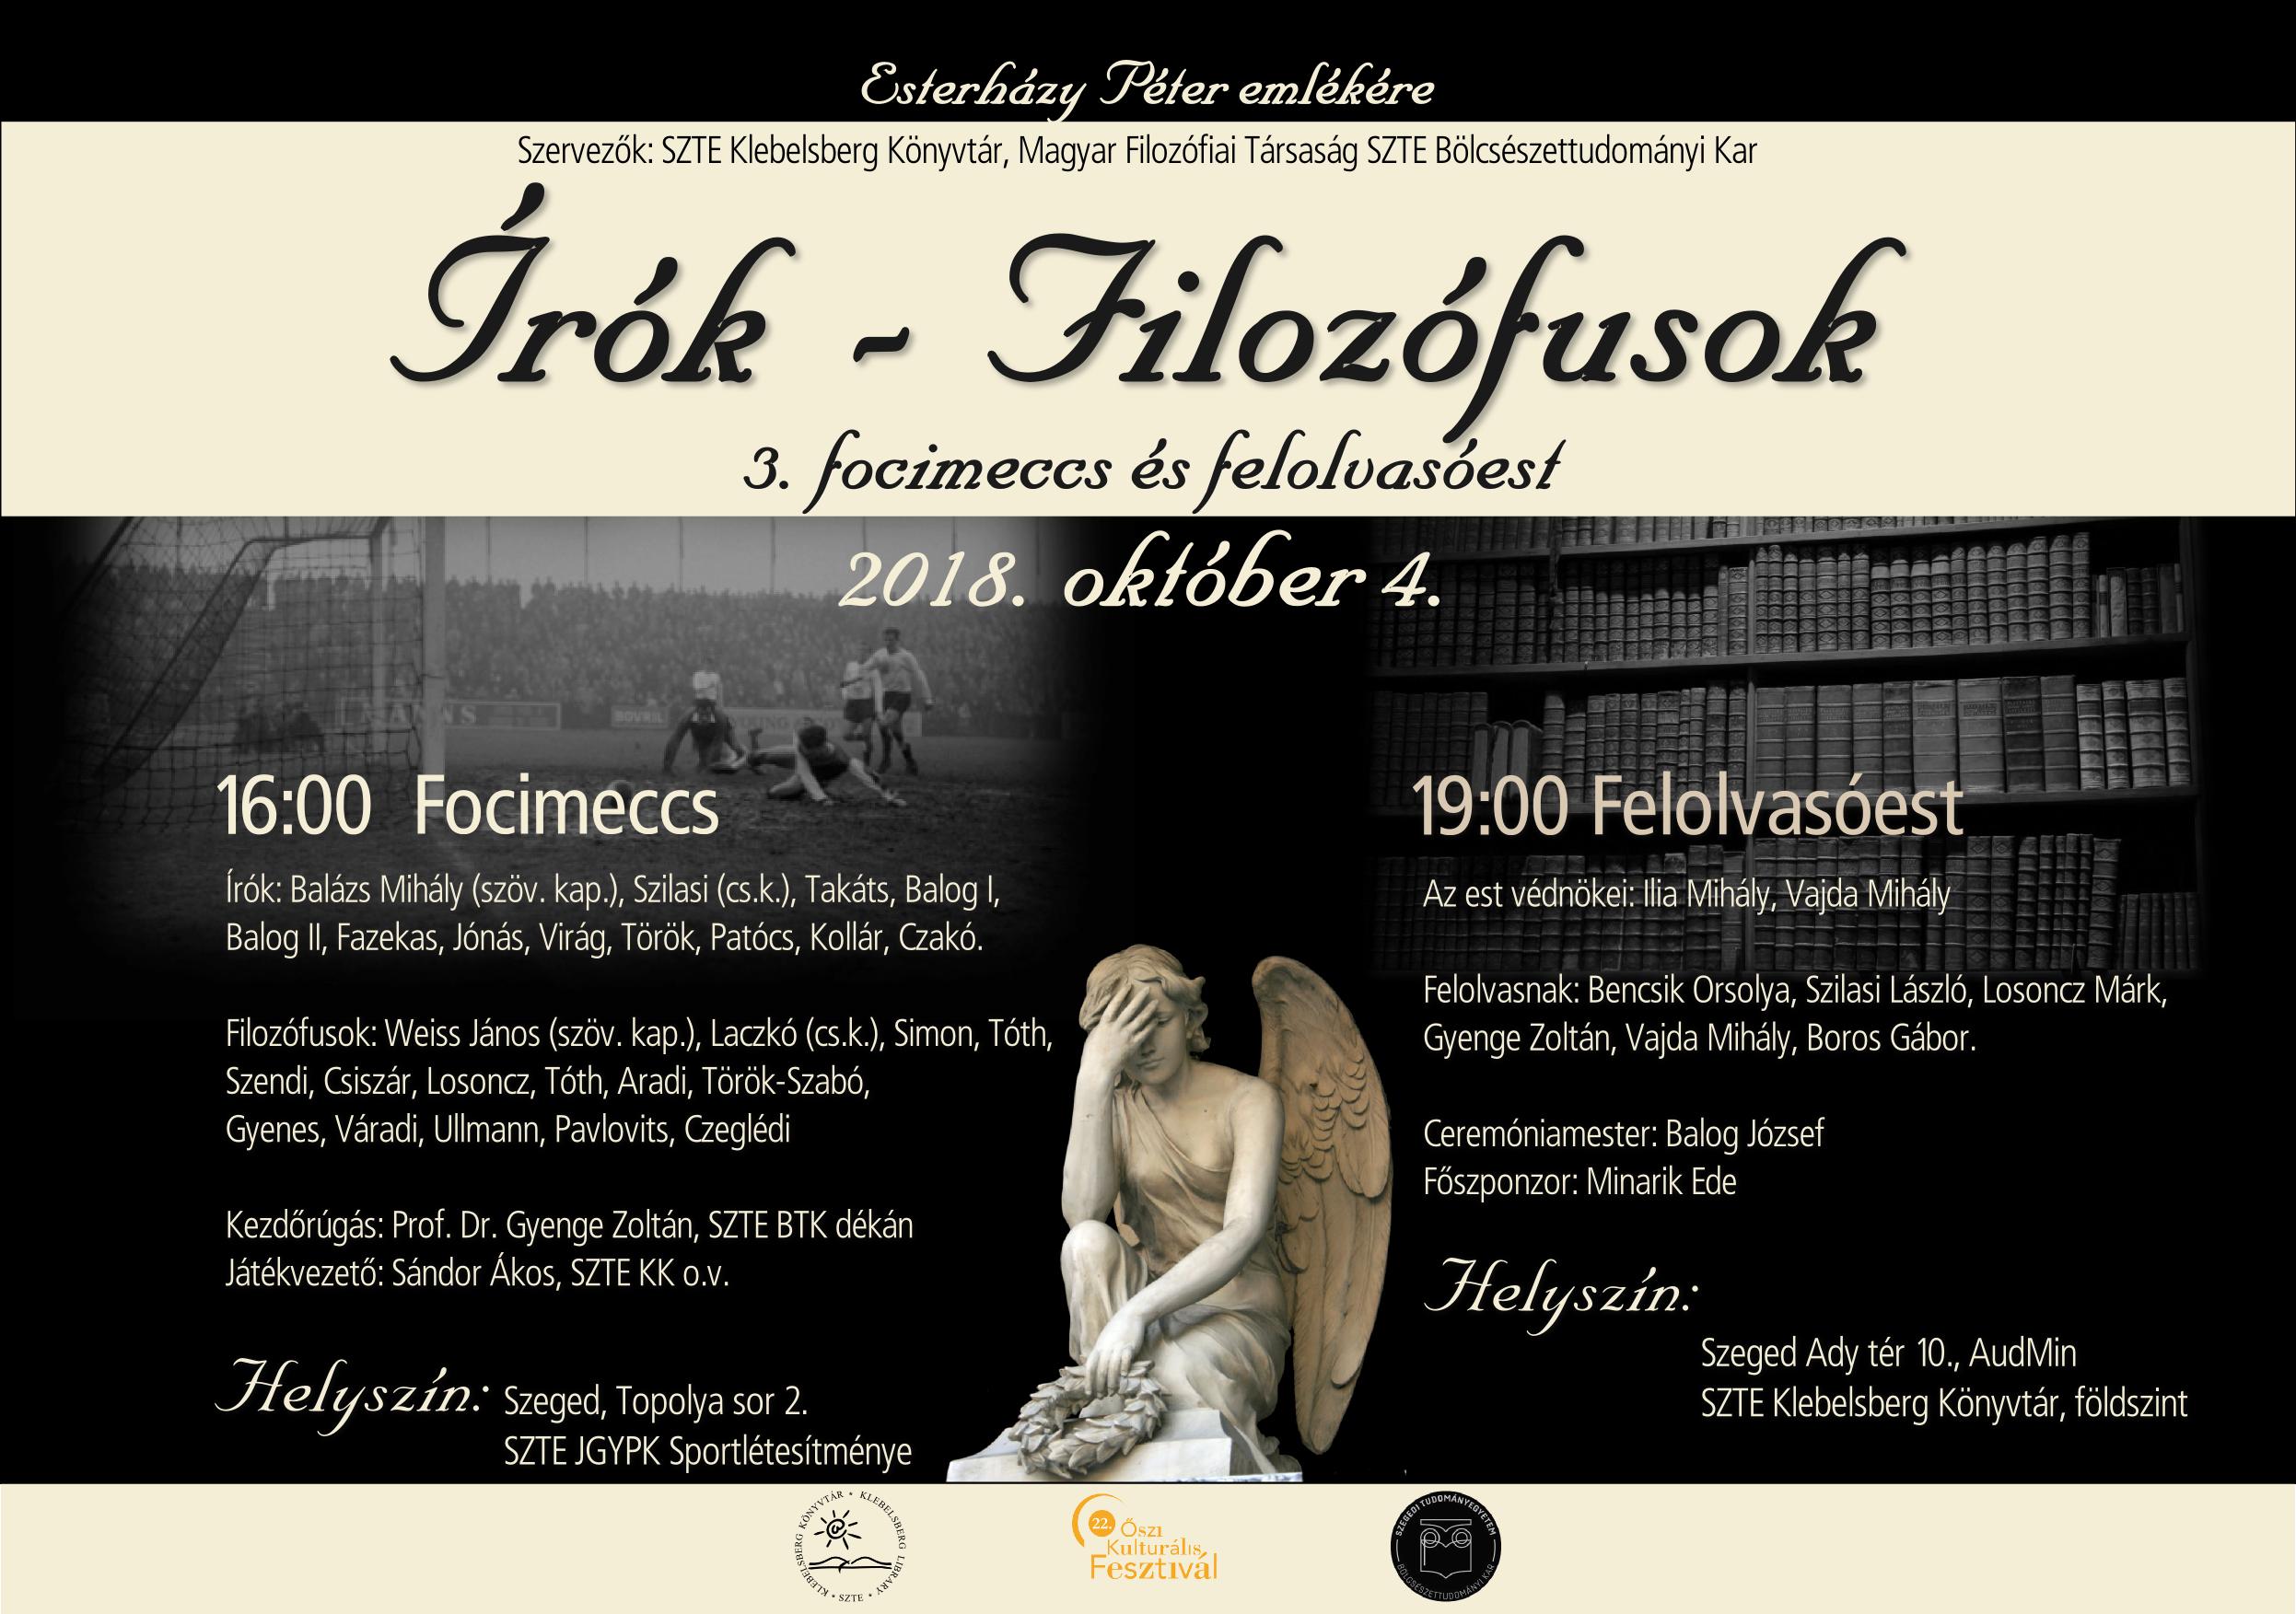 irok_filoz_2018_plakat.png